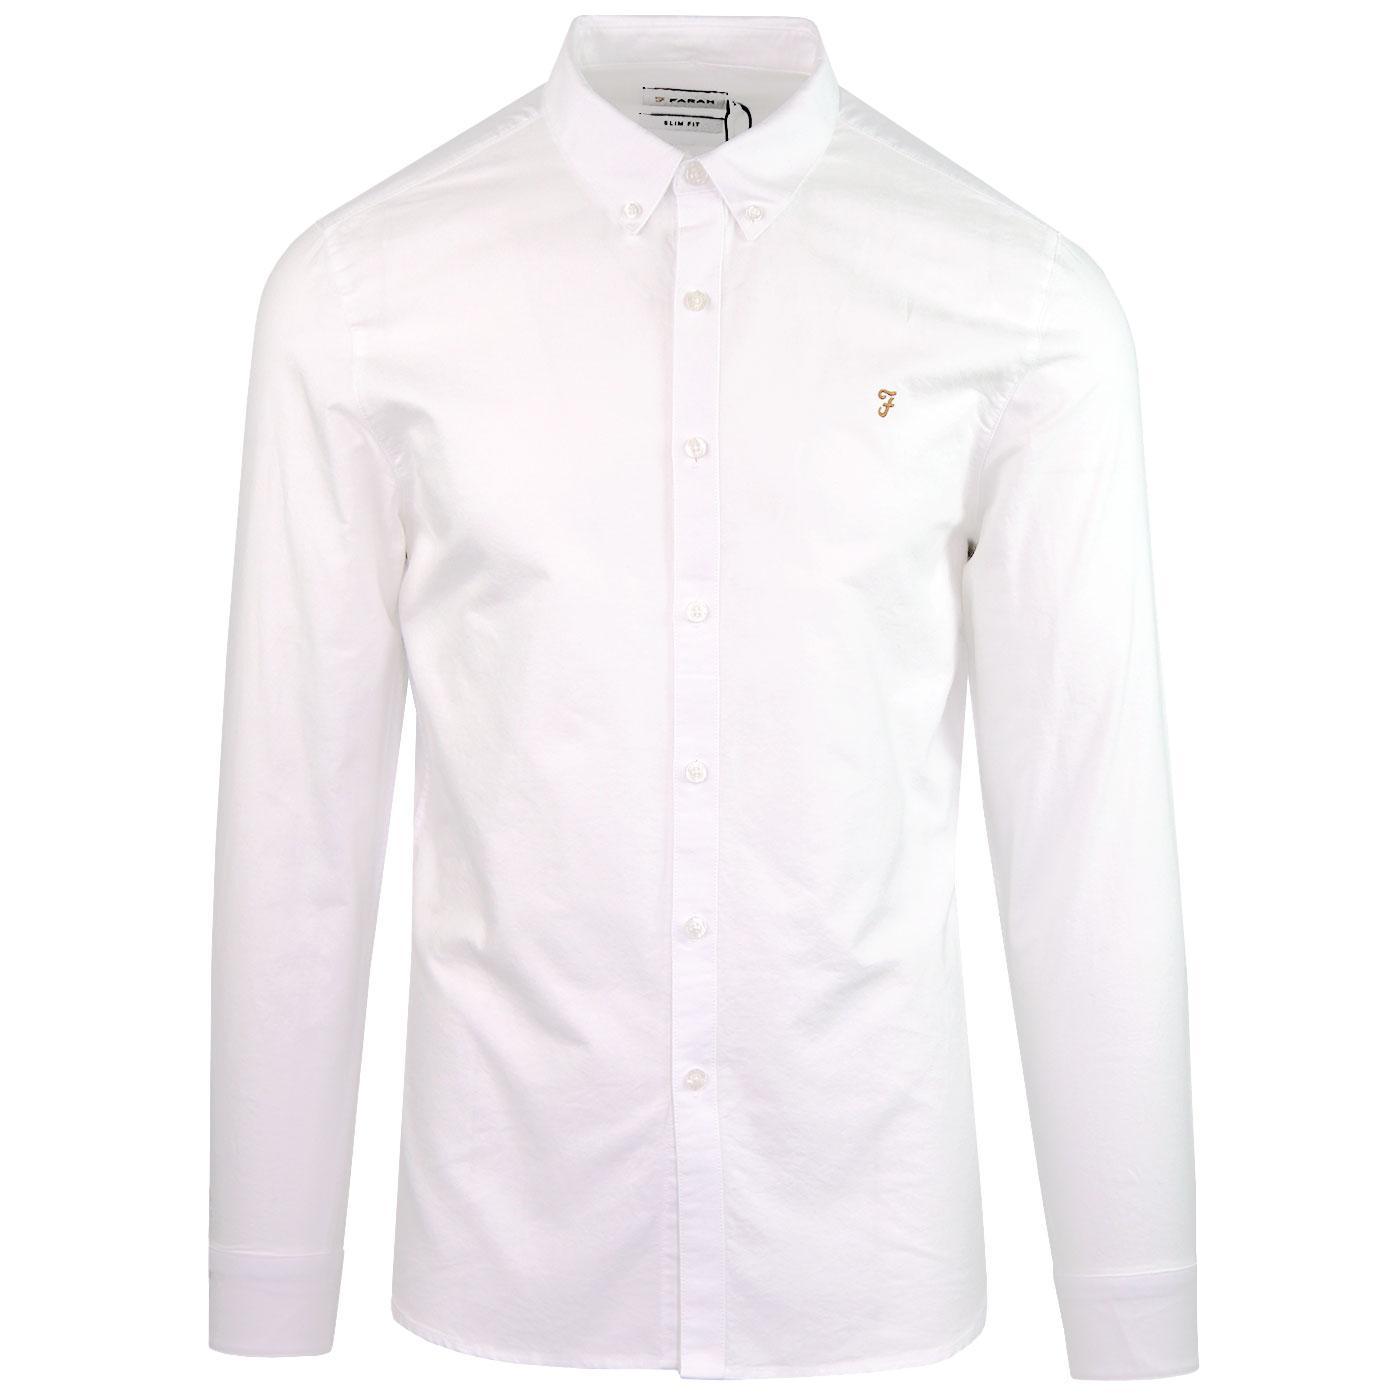 Brewer FARAH VINTAGE Retro 60s Mod Oxford Shirt W